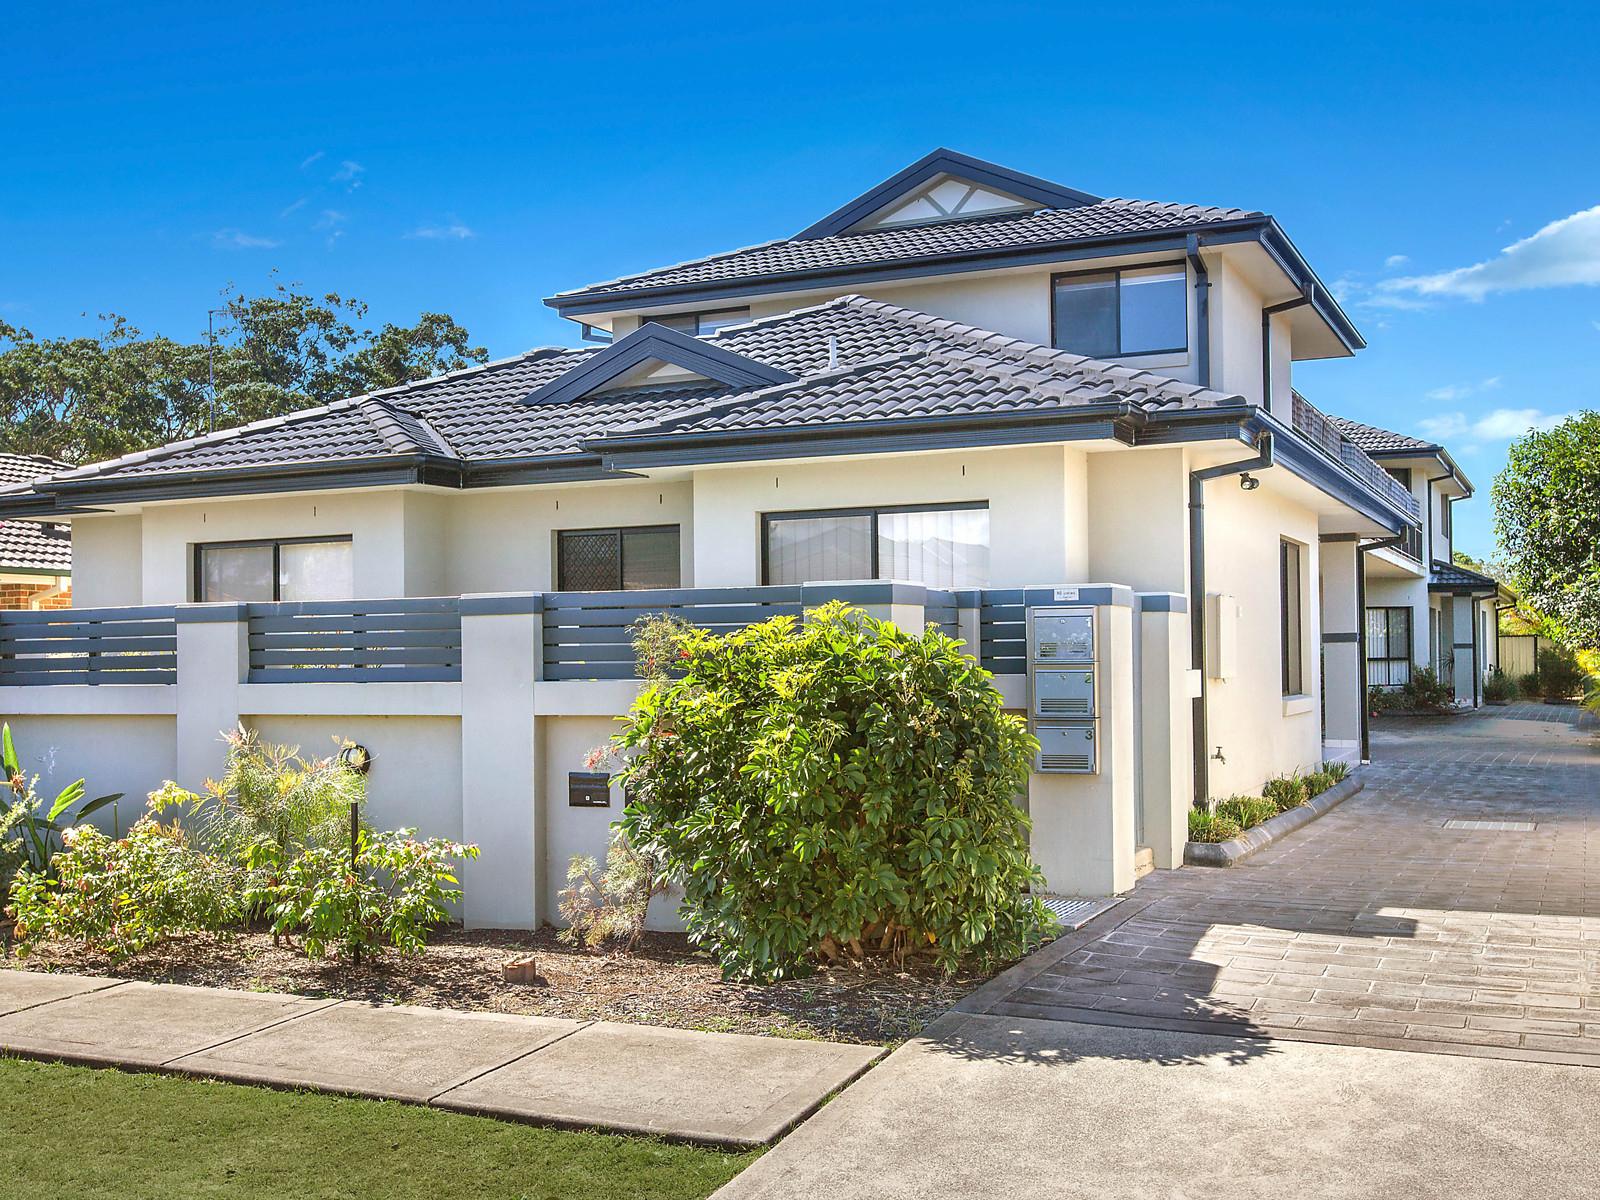 Brochure for 3 1 warrah street ettalong beach nsw for Beach house designs central coast nsw